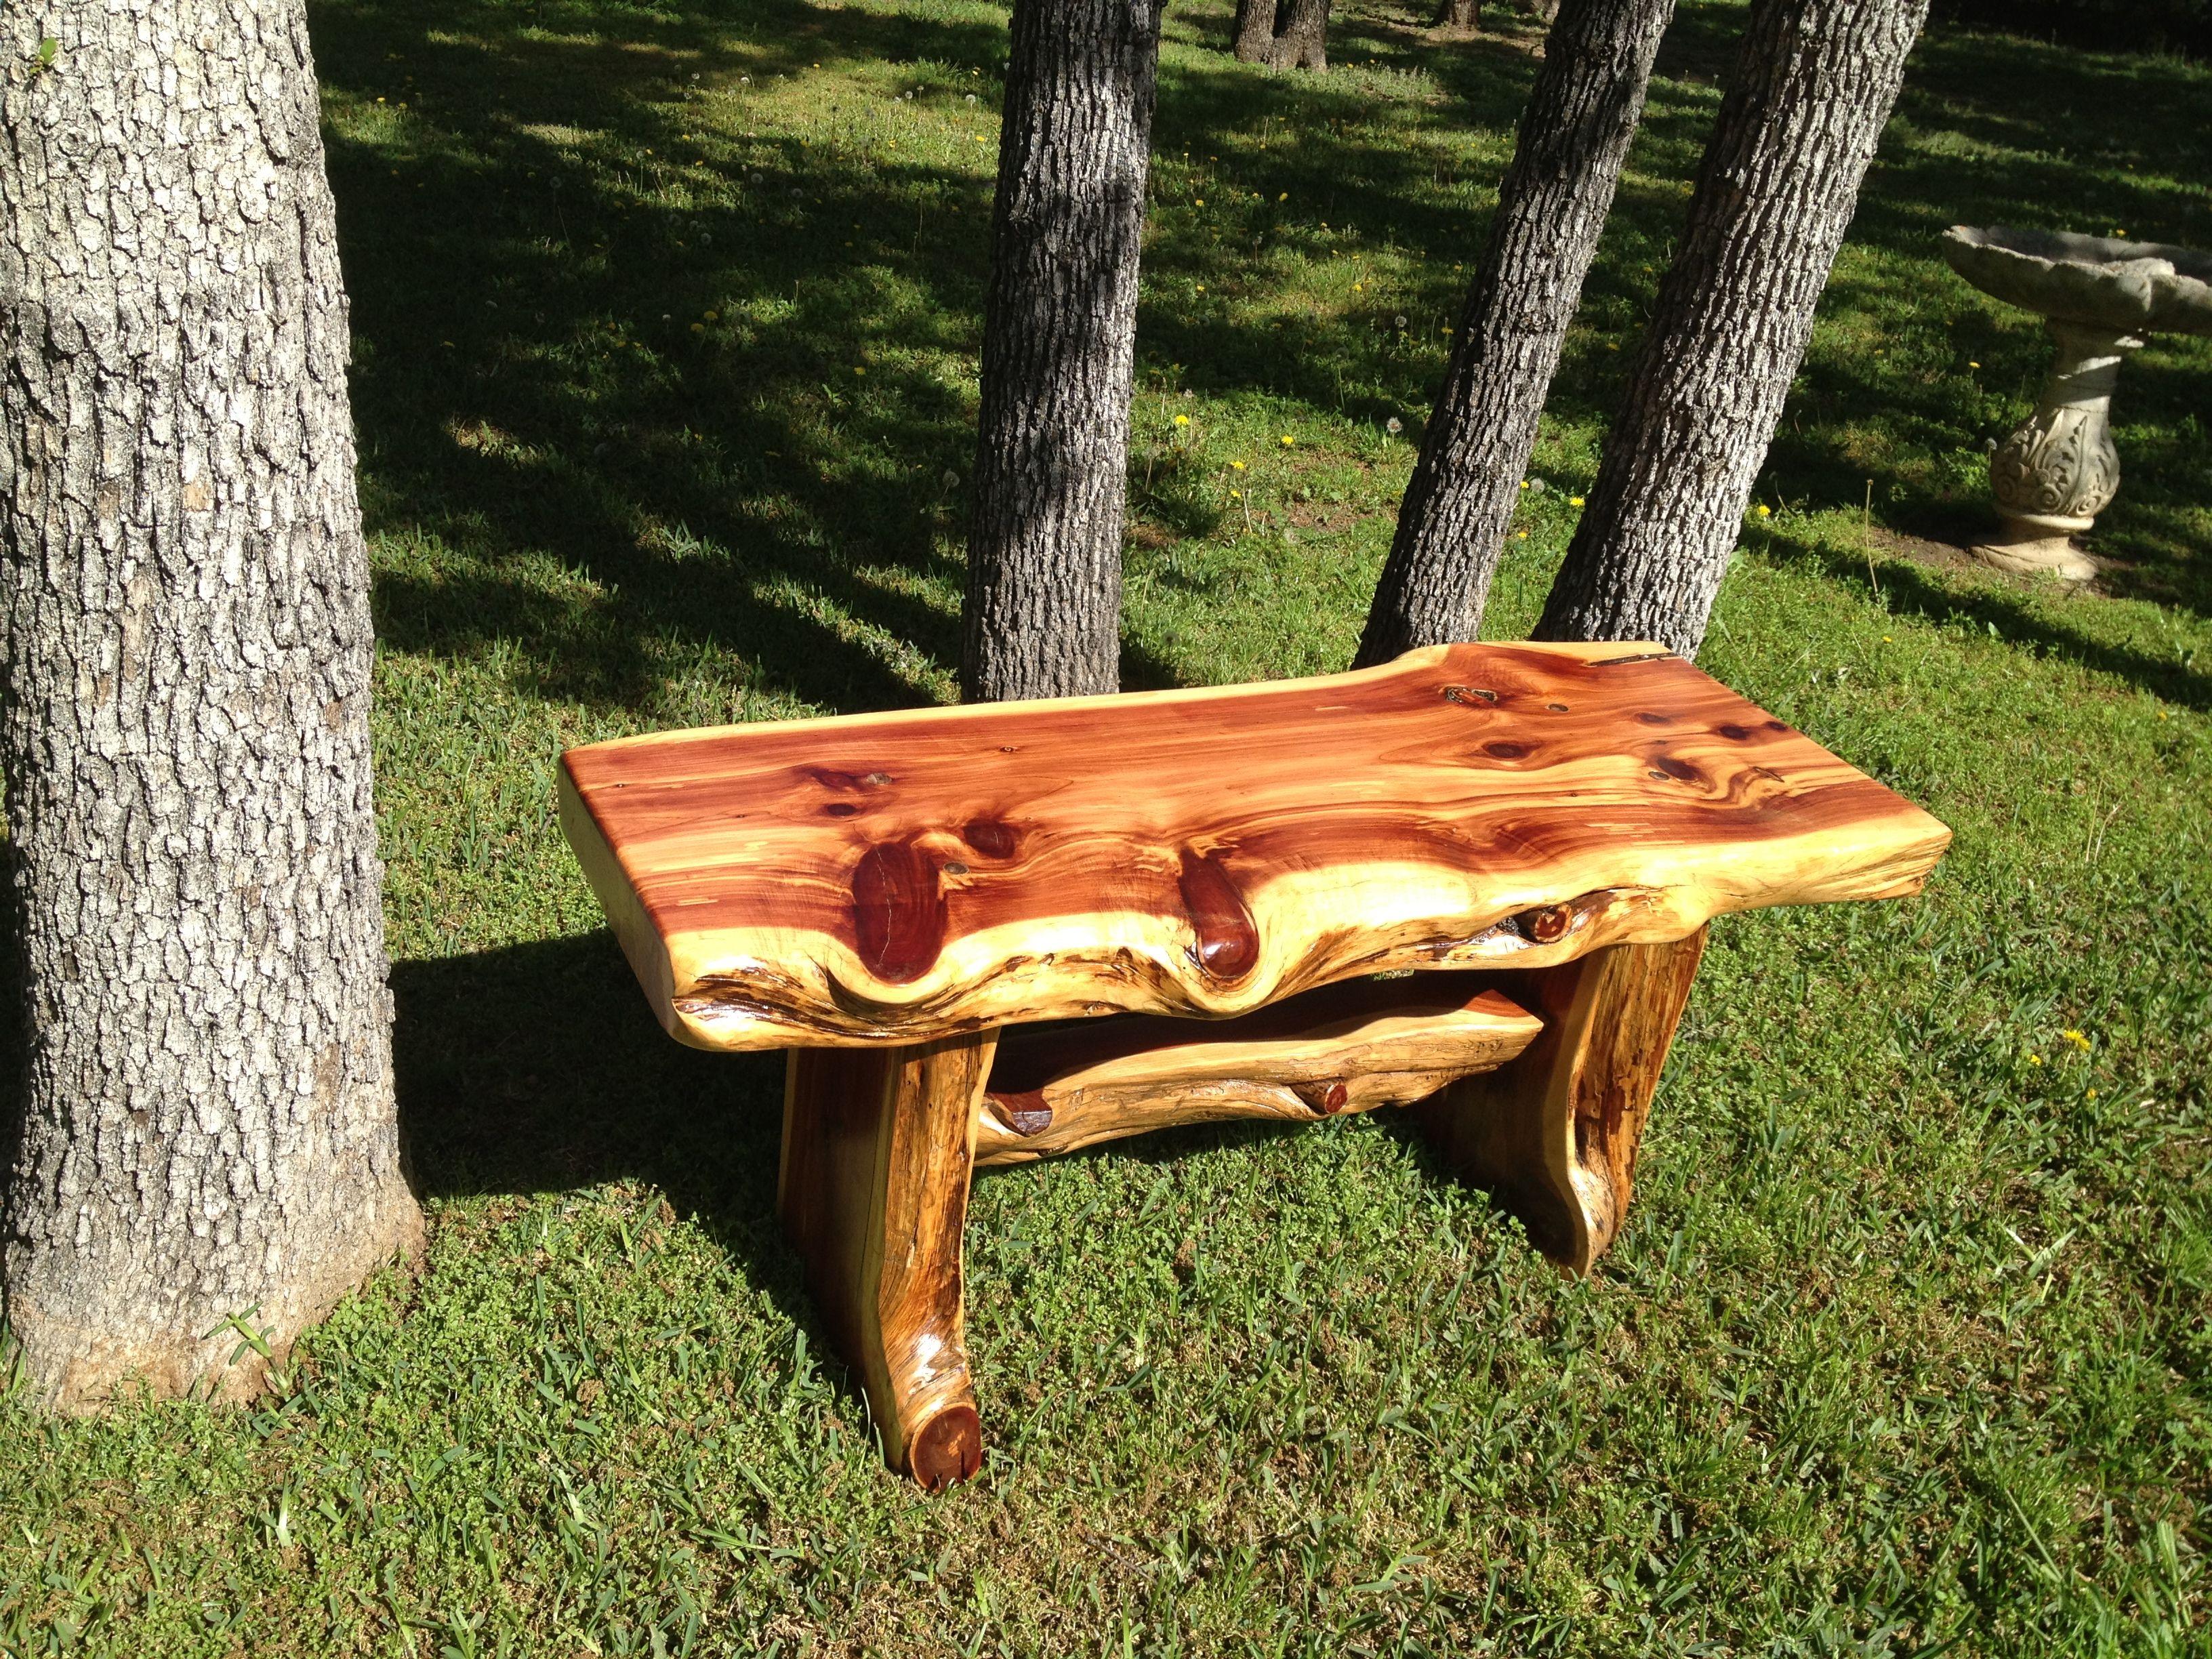 Cedar Bench Handmade In Texas Home Sweet Home Pinterest